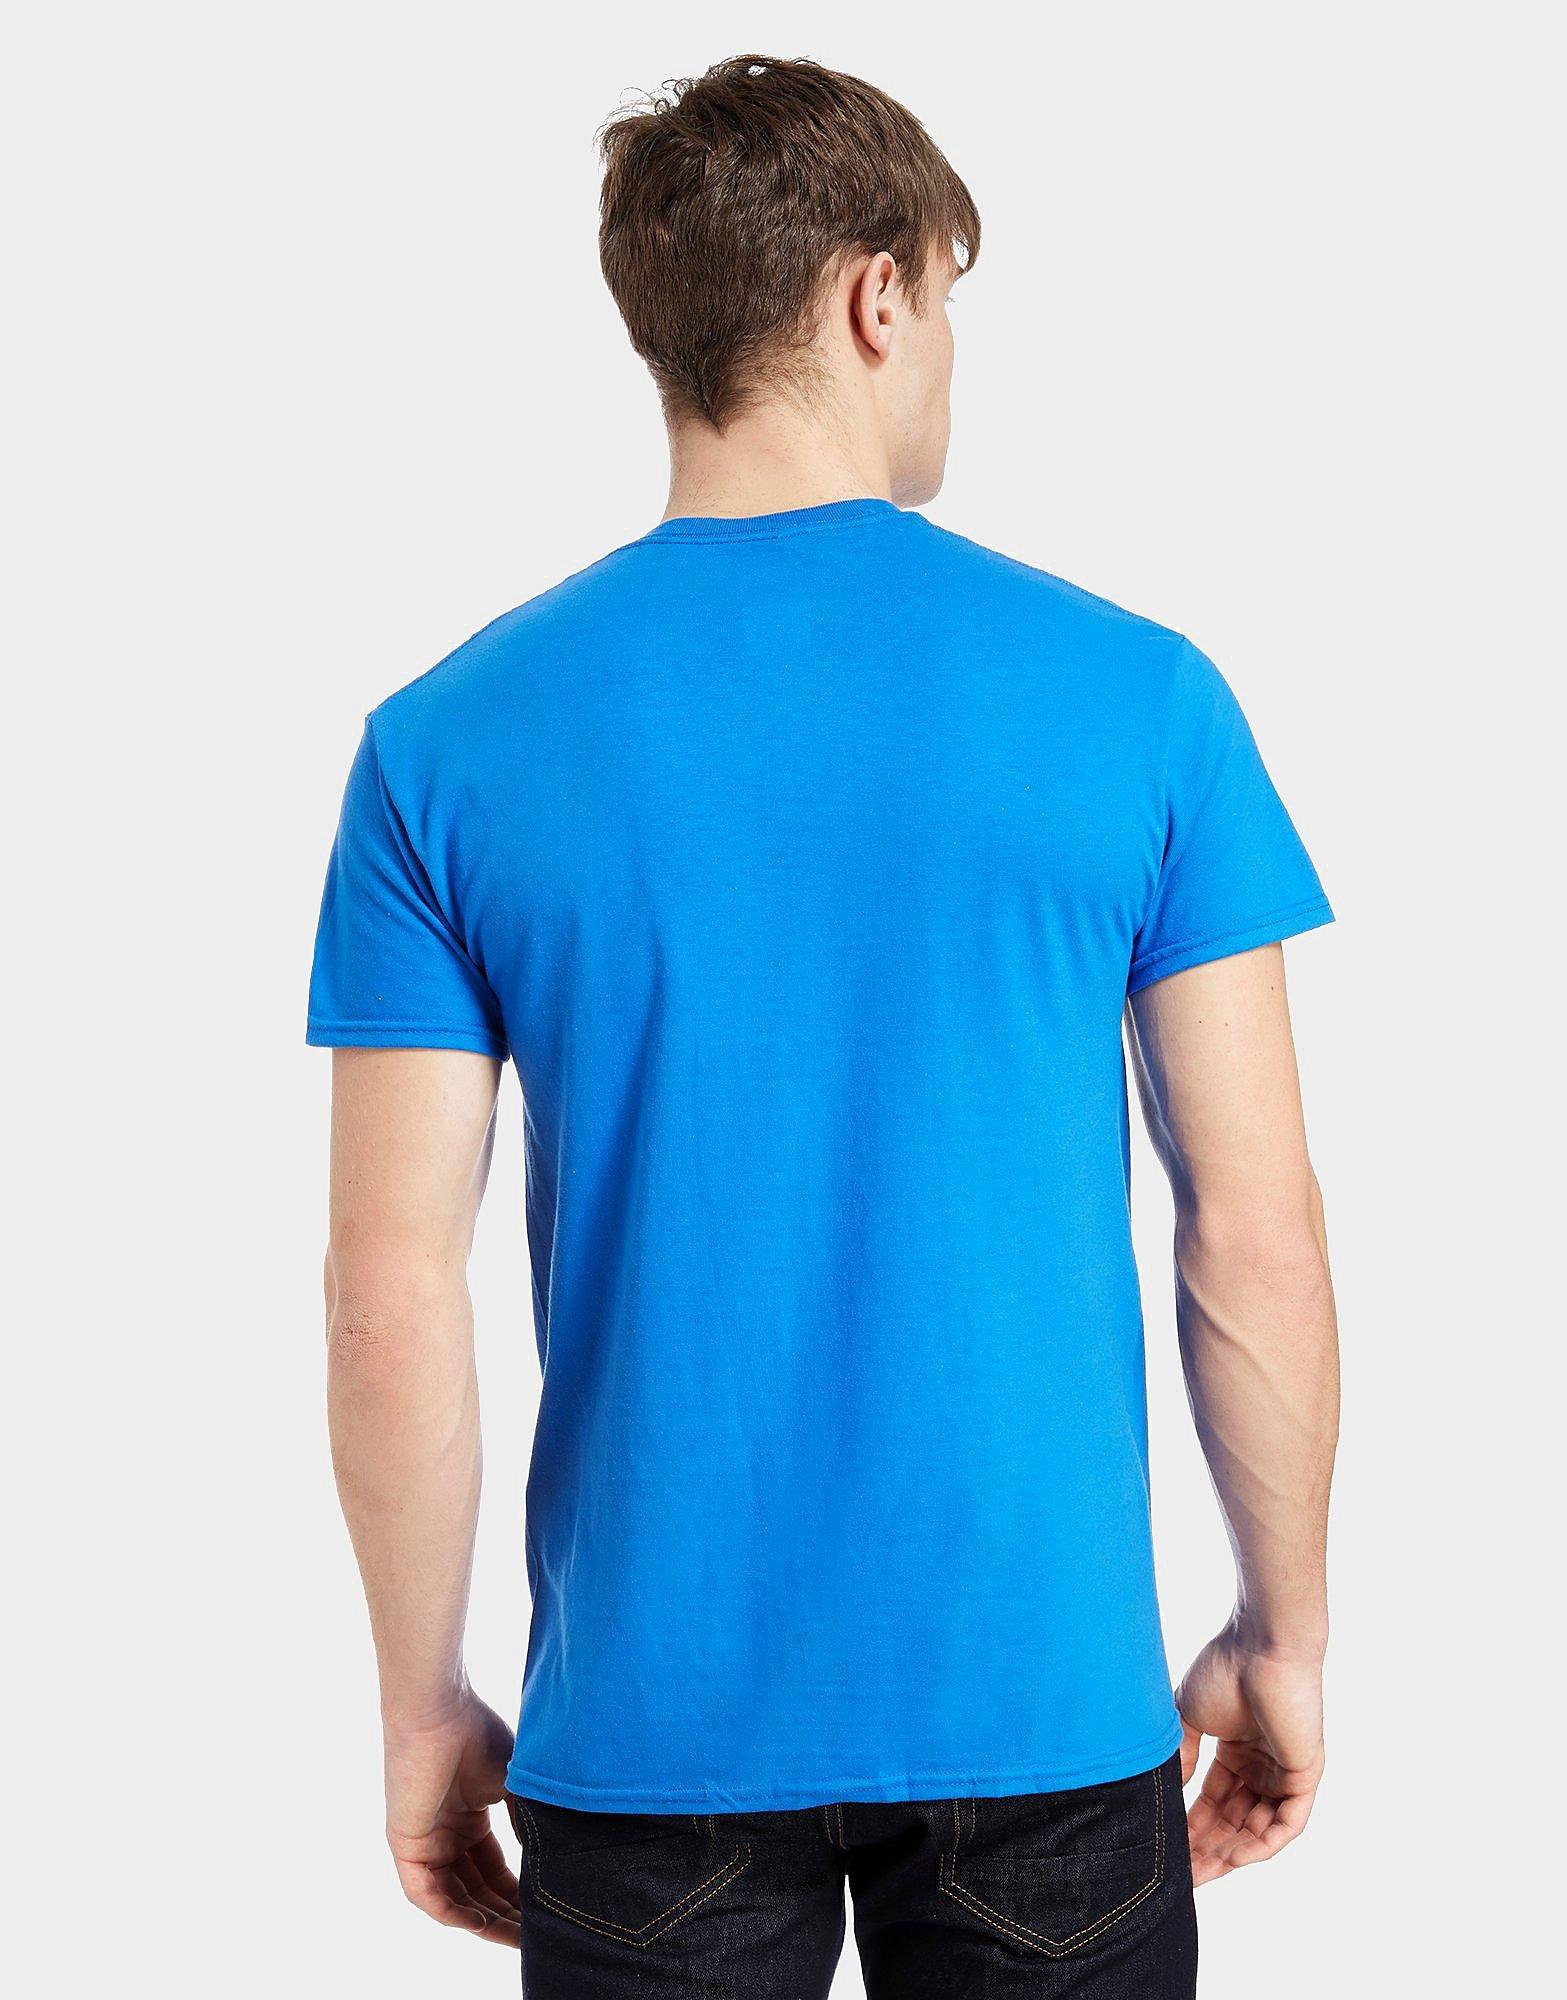 Official Team T-shirt Everton F.C 1878